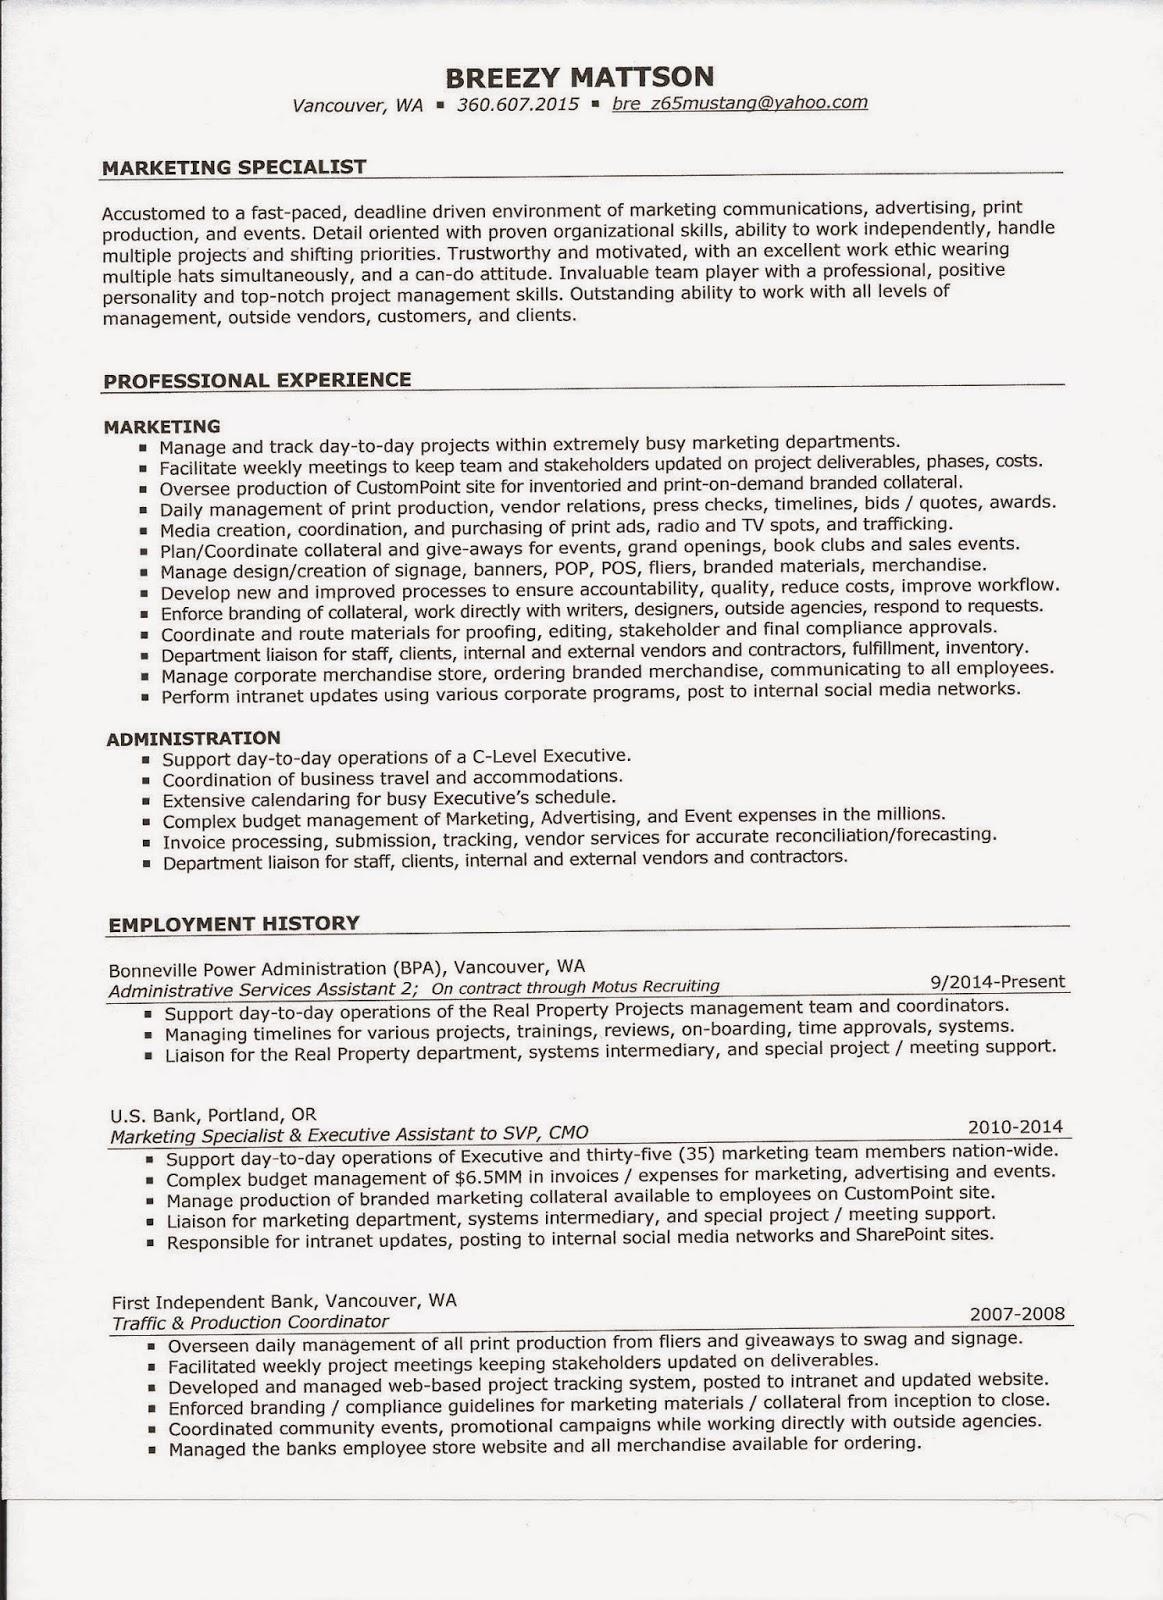 Say Detail Oriented Resume